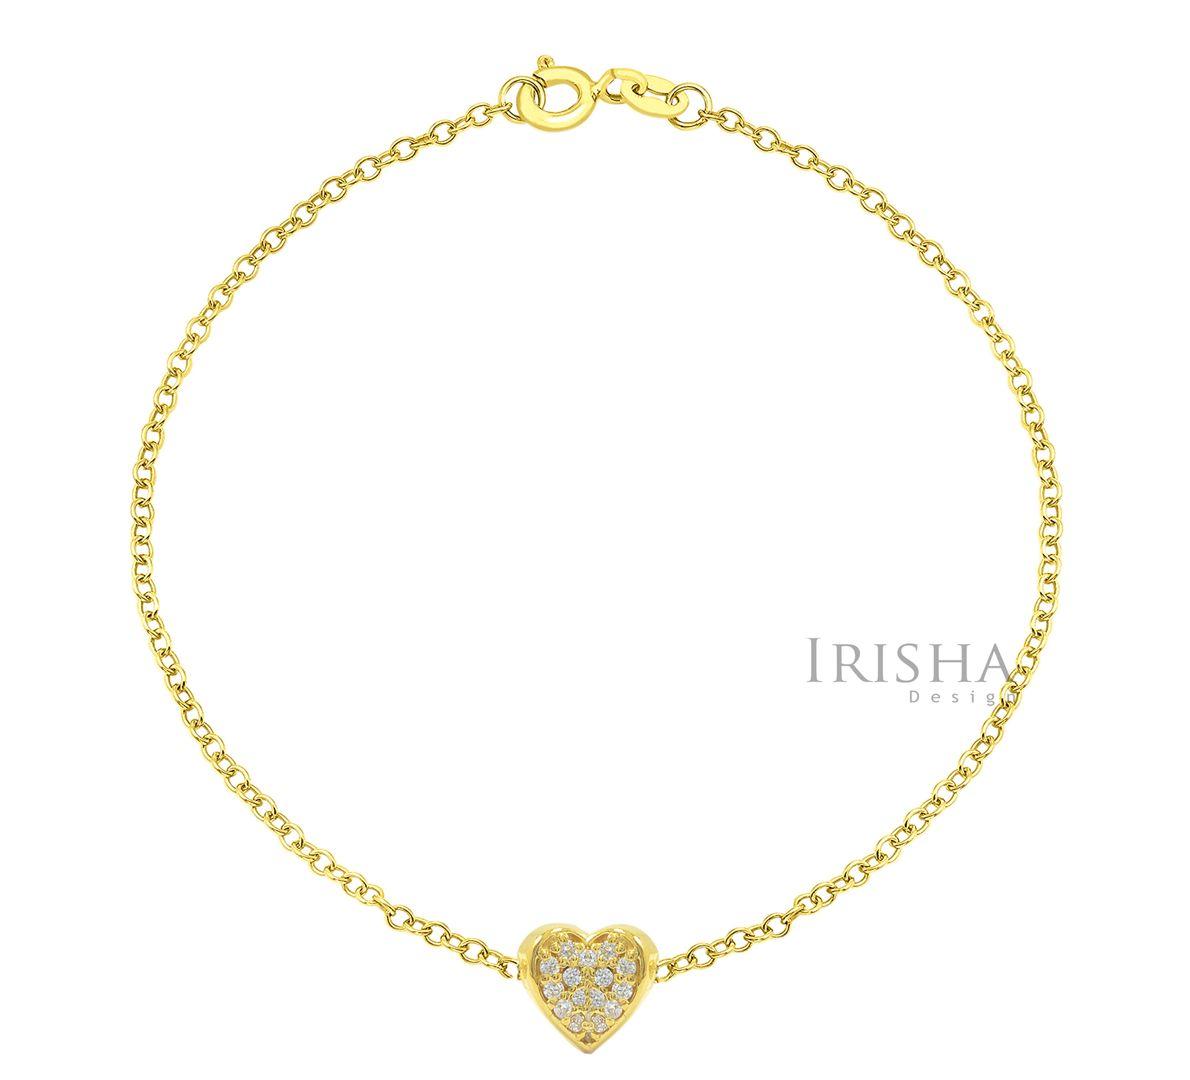 0.10 Ct. Genuine Diamond Love Heart Wedding Bracelet Fine Jewelry 14K Gold